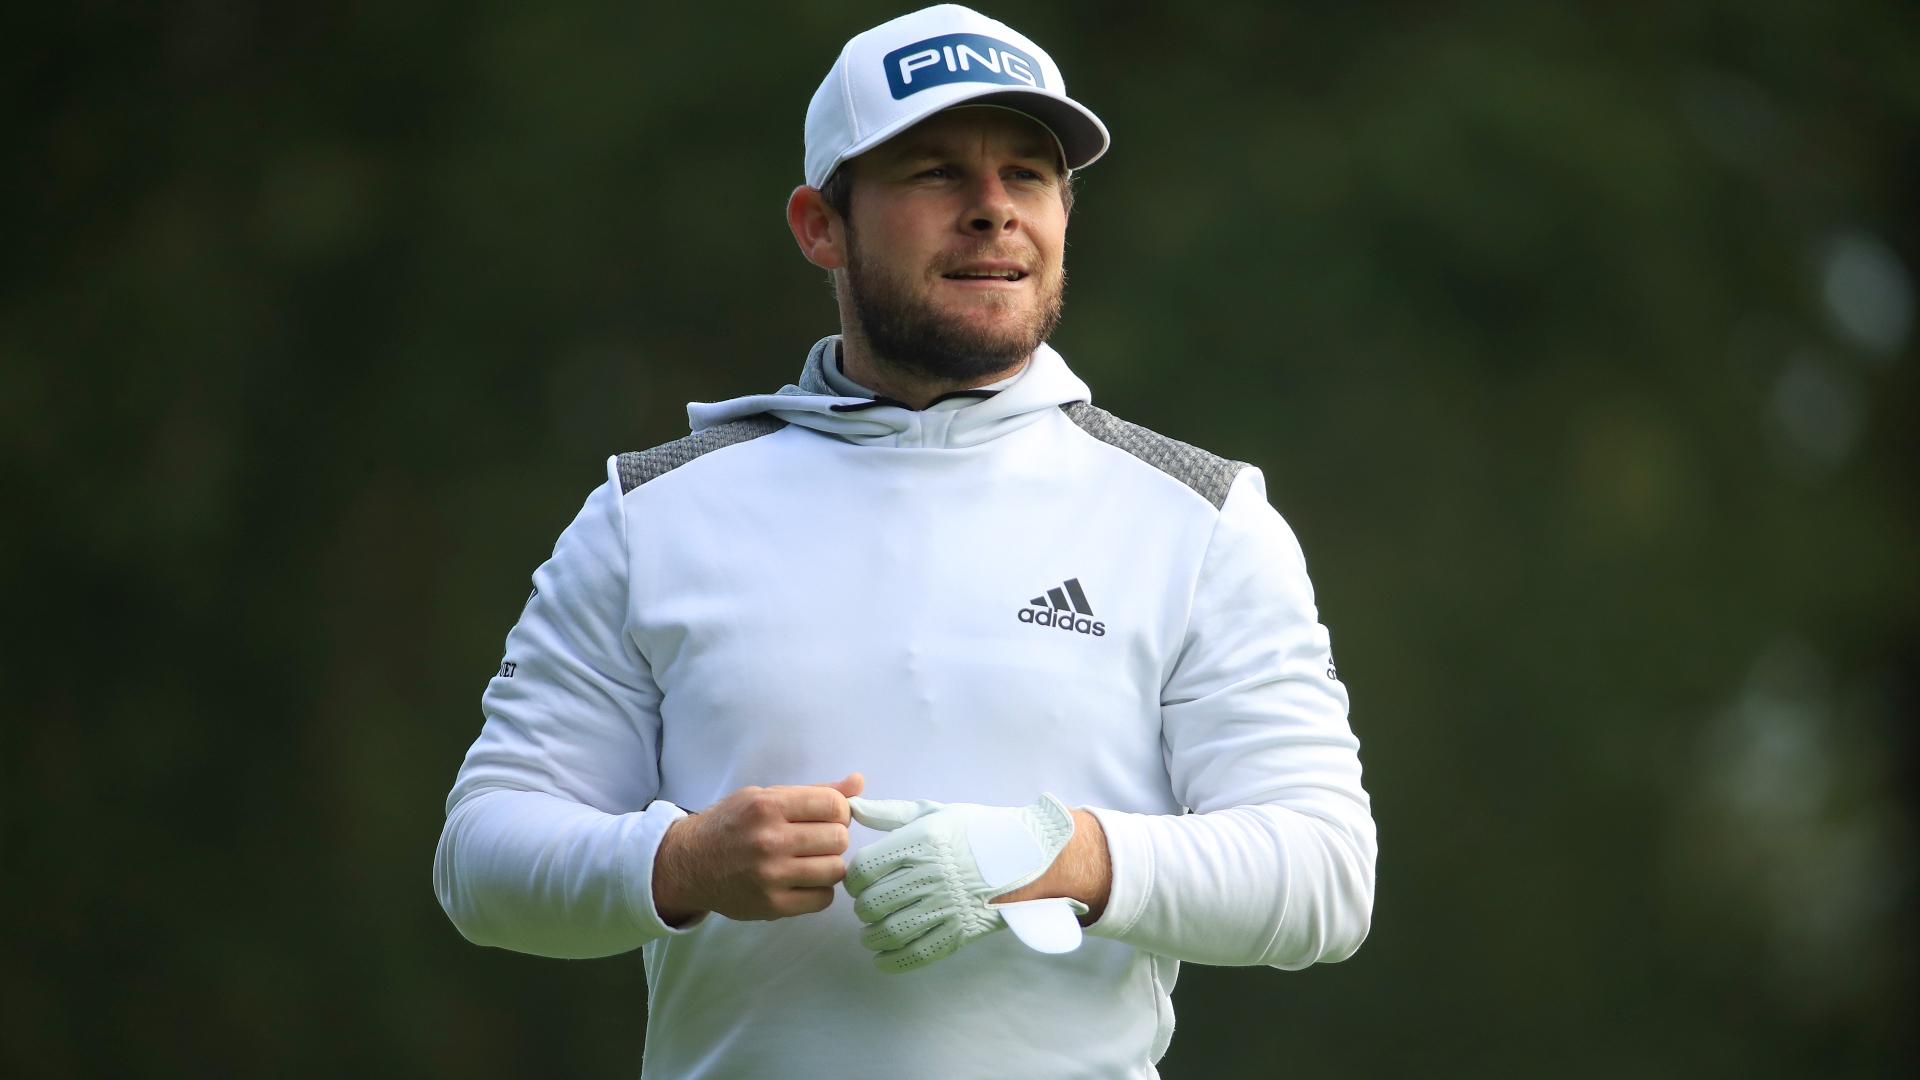 Hatton takes three-shot lead into final round of BMW PGA Championship